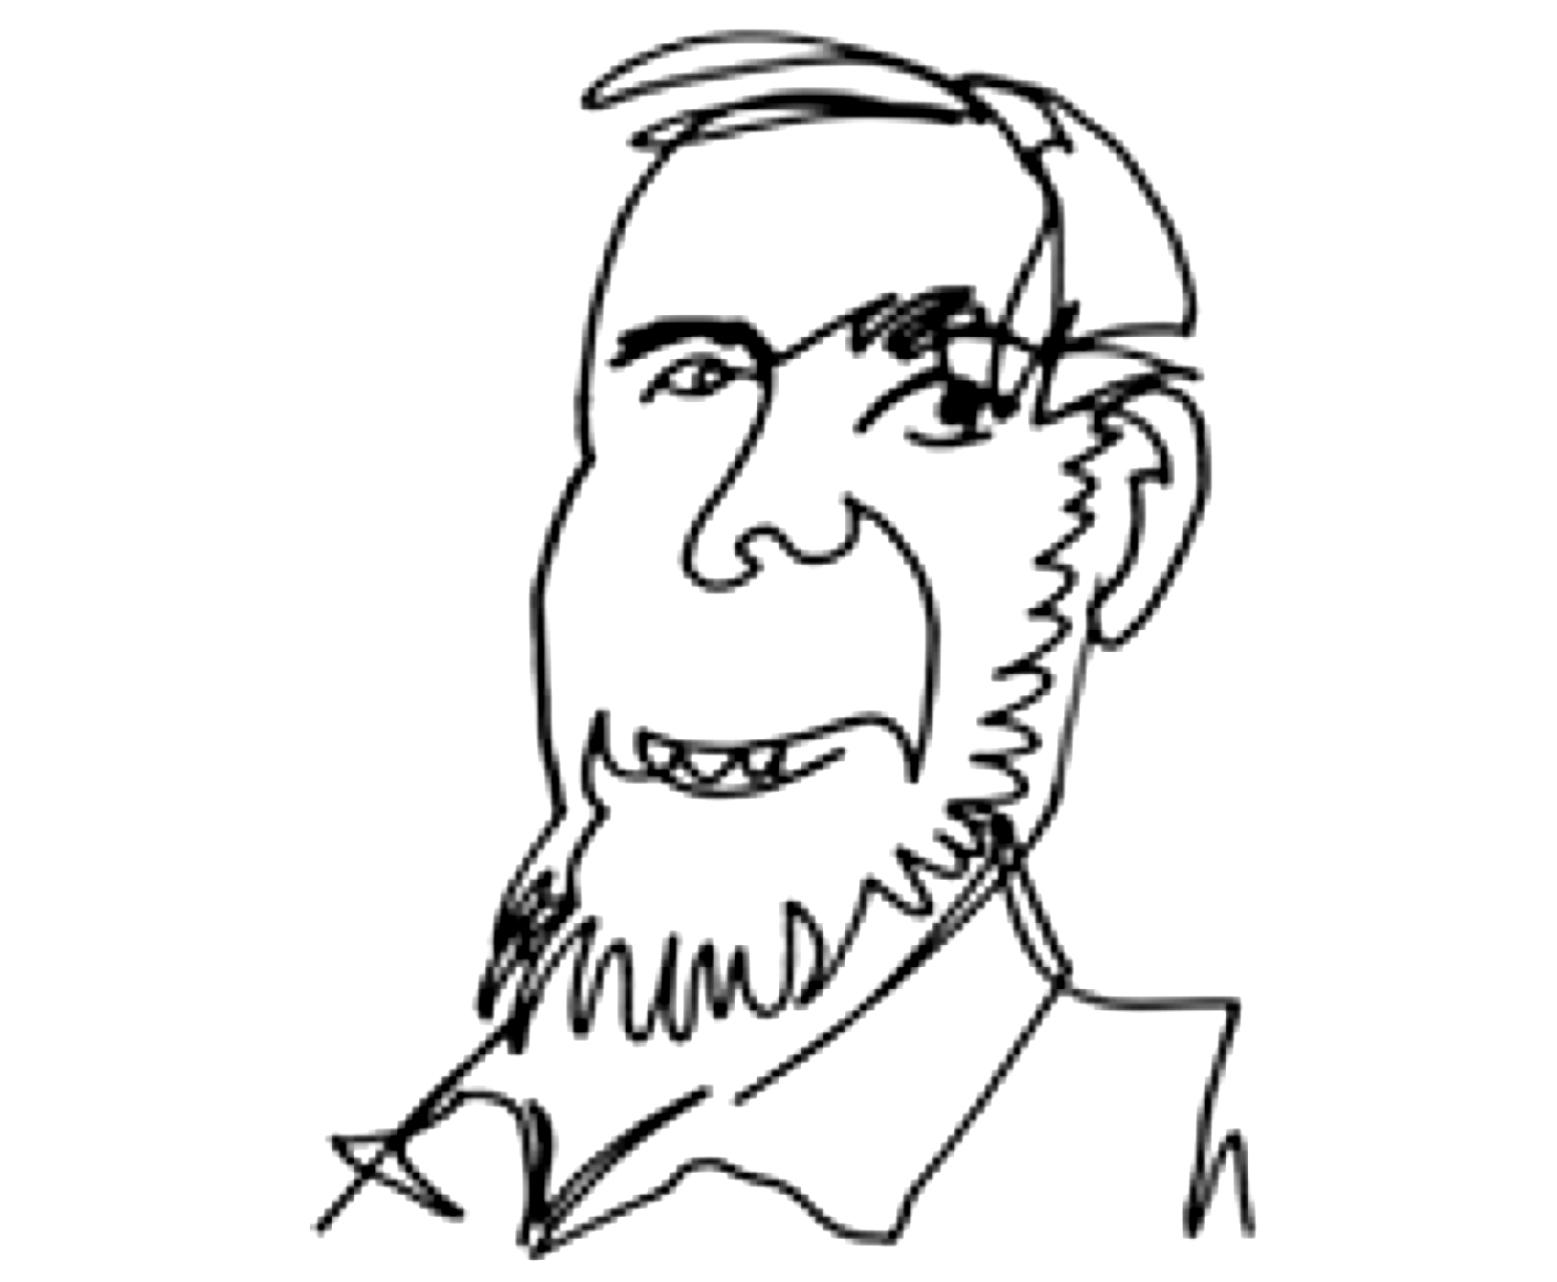 Mr Kelly's line drawn avatar